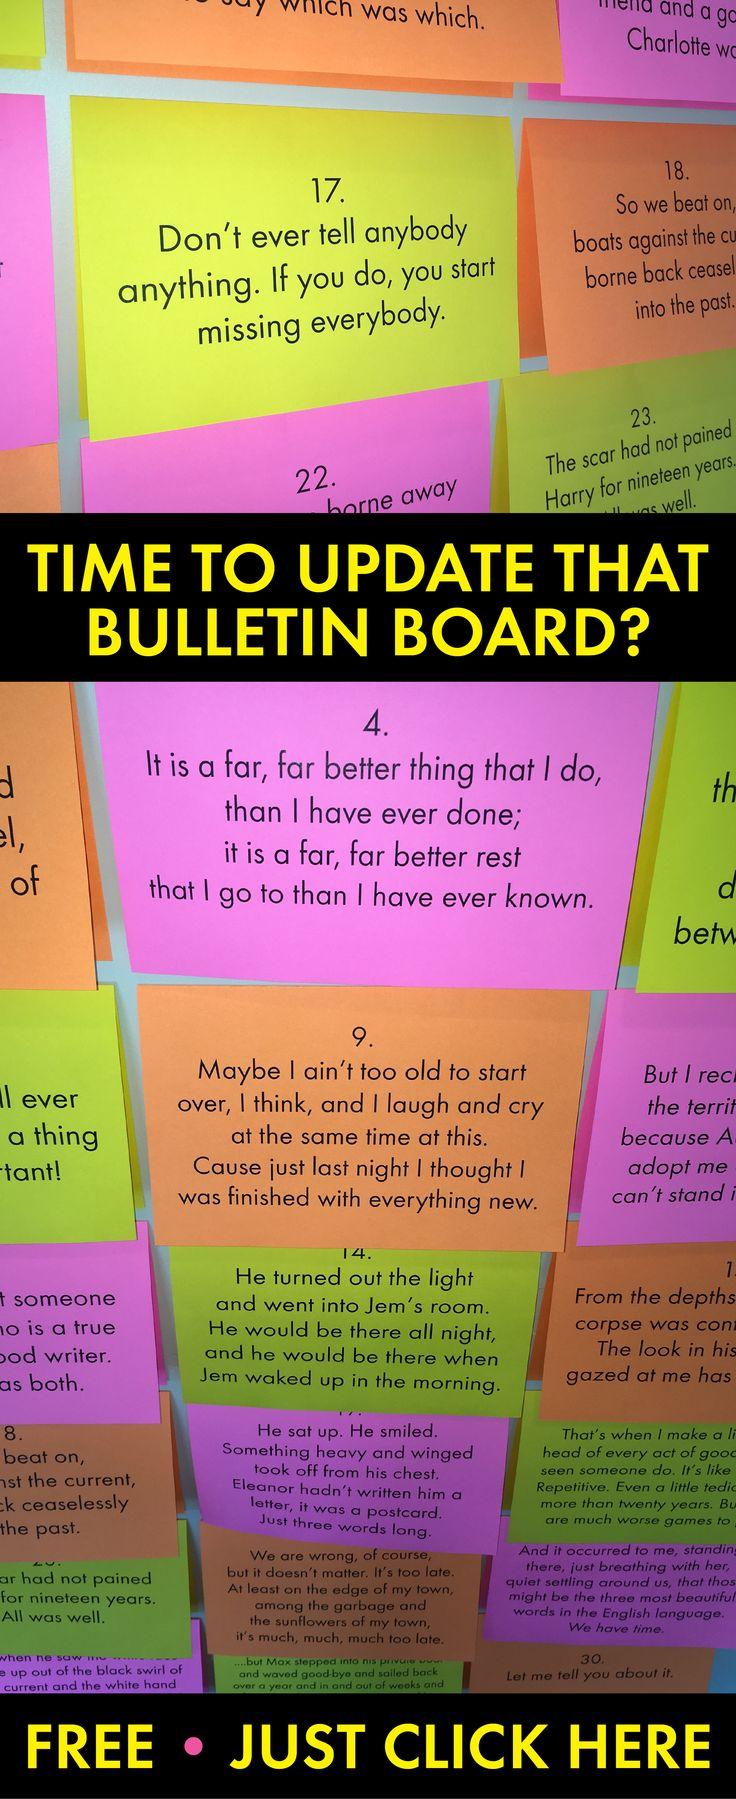 Free bulletin board materials. Just print and post! #ELA #Englishteacher #library #bulletinboard #free #freebie